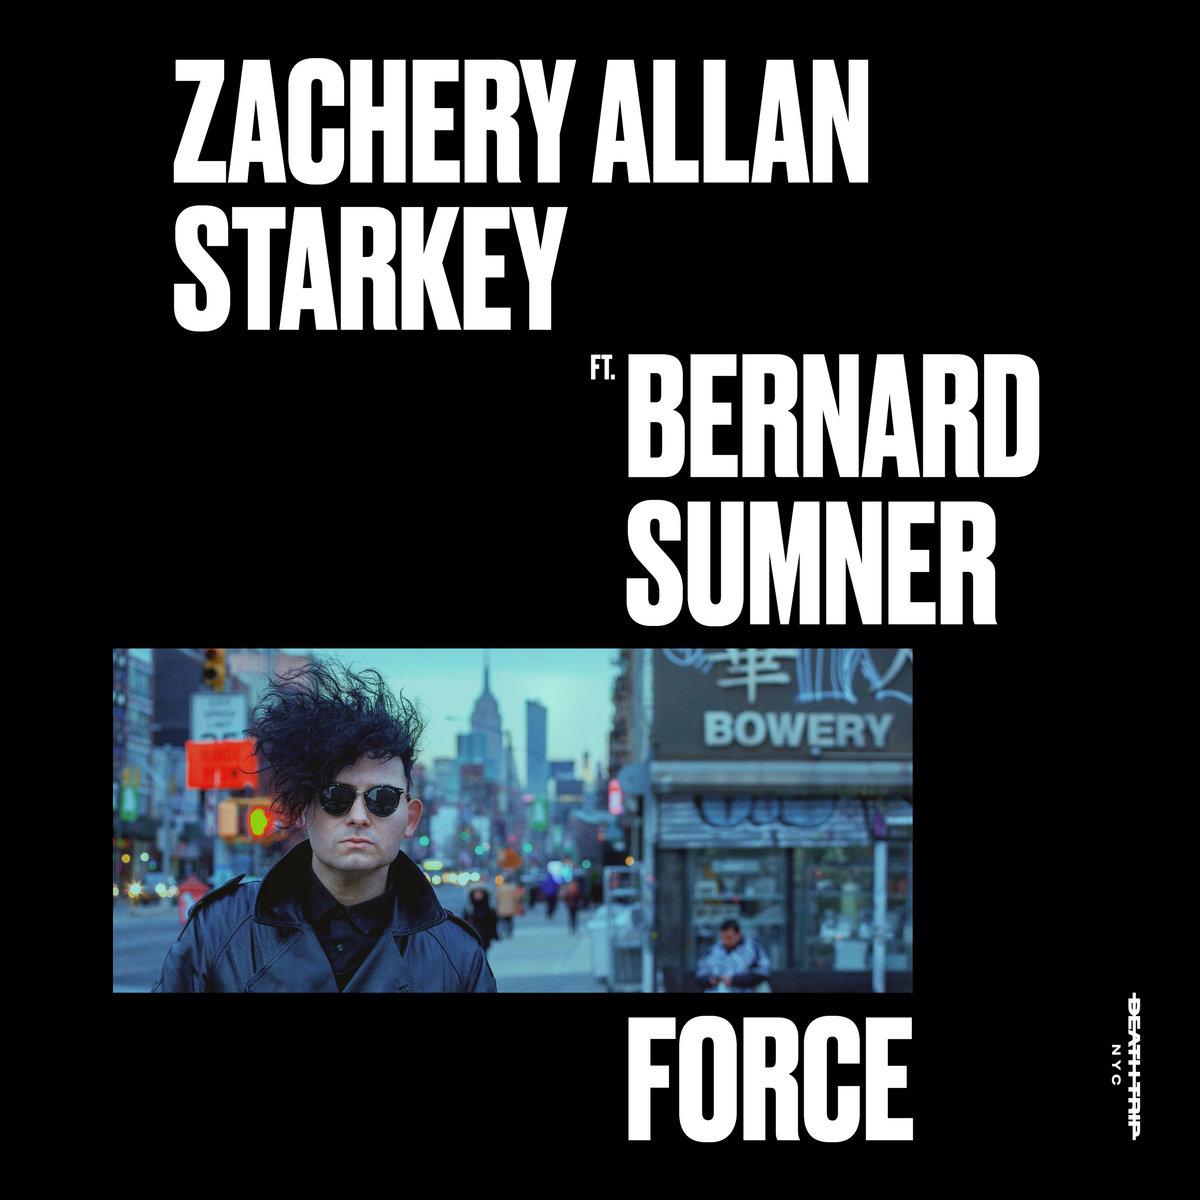 Electro News @- Zachery Allan Starkey – Force (ft. Bernard Sumner)